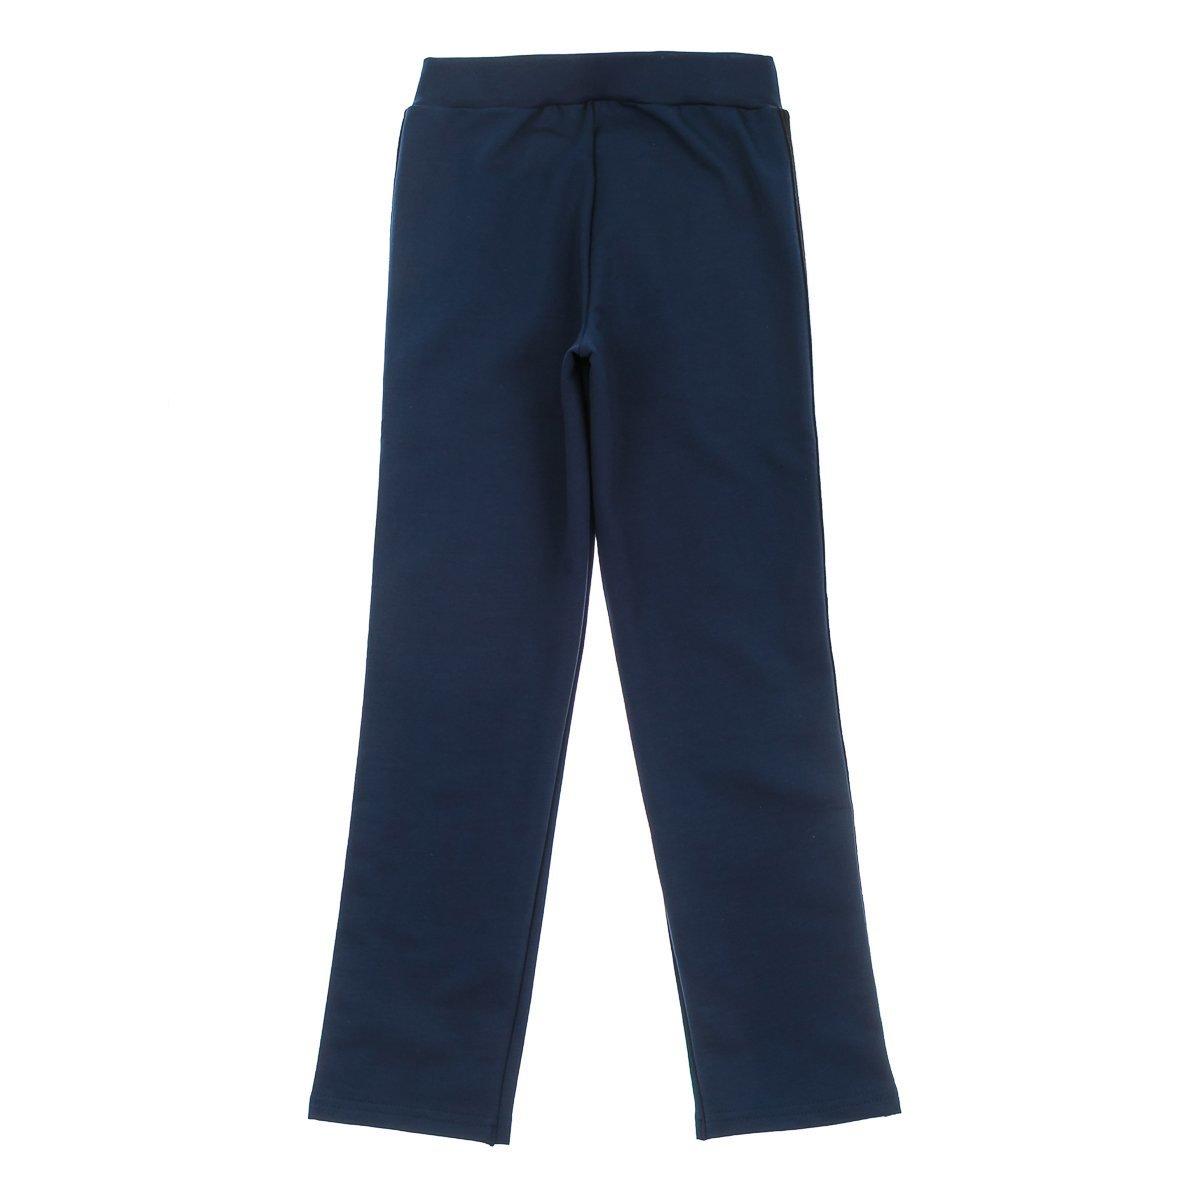 Купить Брюки, джинсы, шорты, Брюки Smil Alice, р. 128 115350 ТМ: SMIL, синий